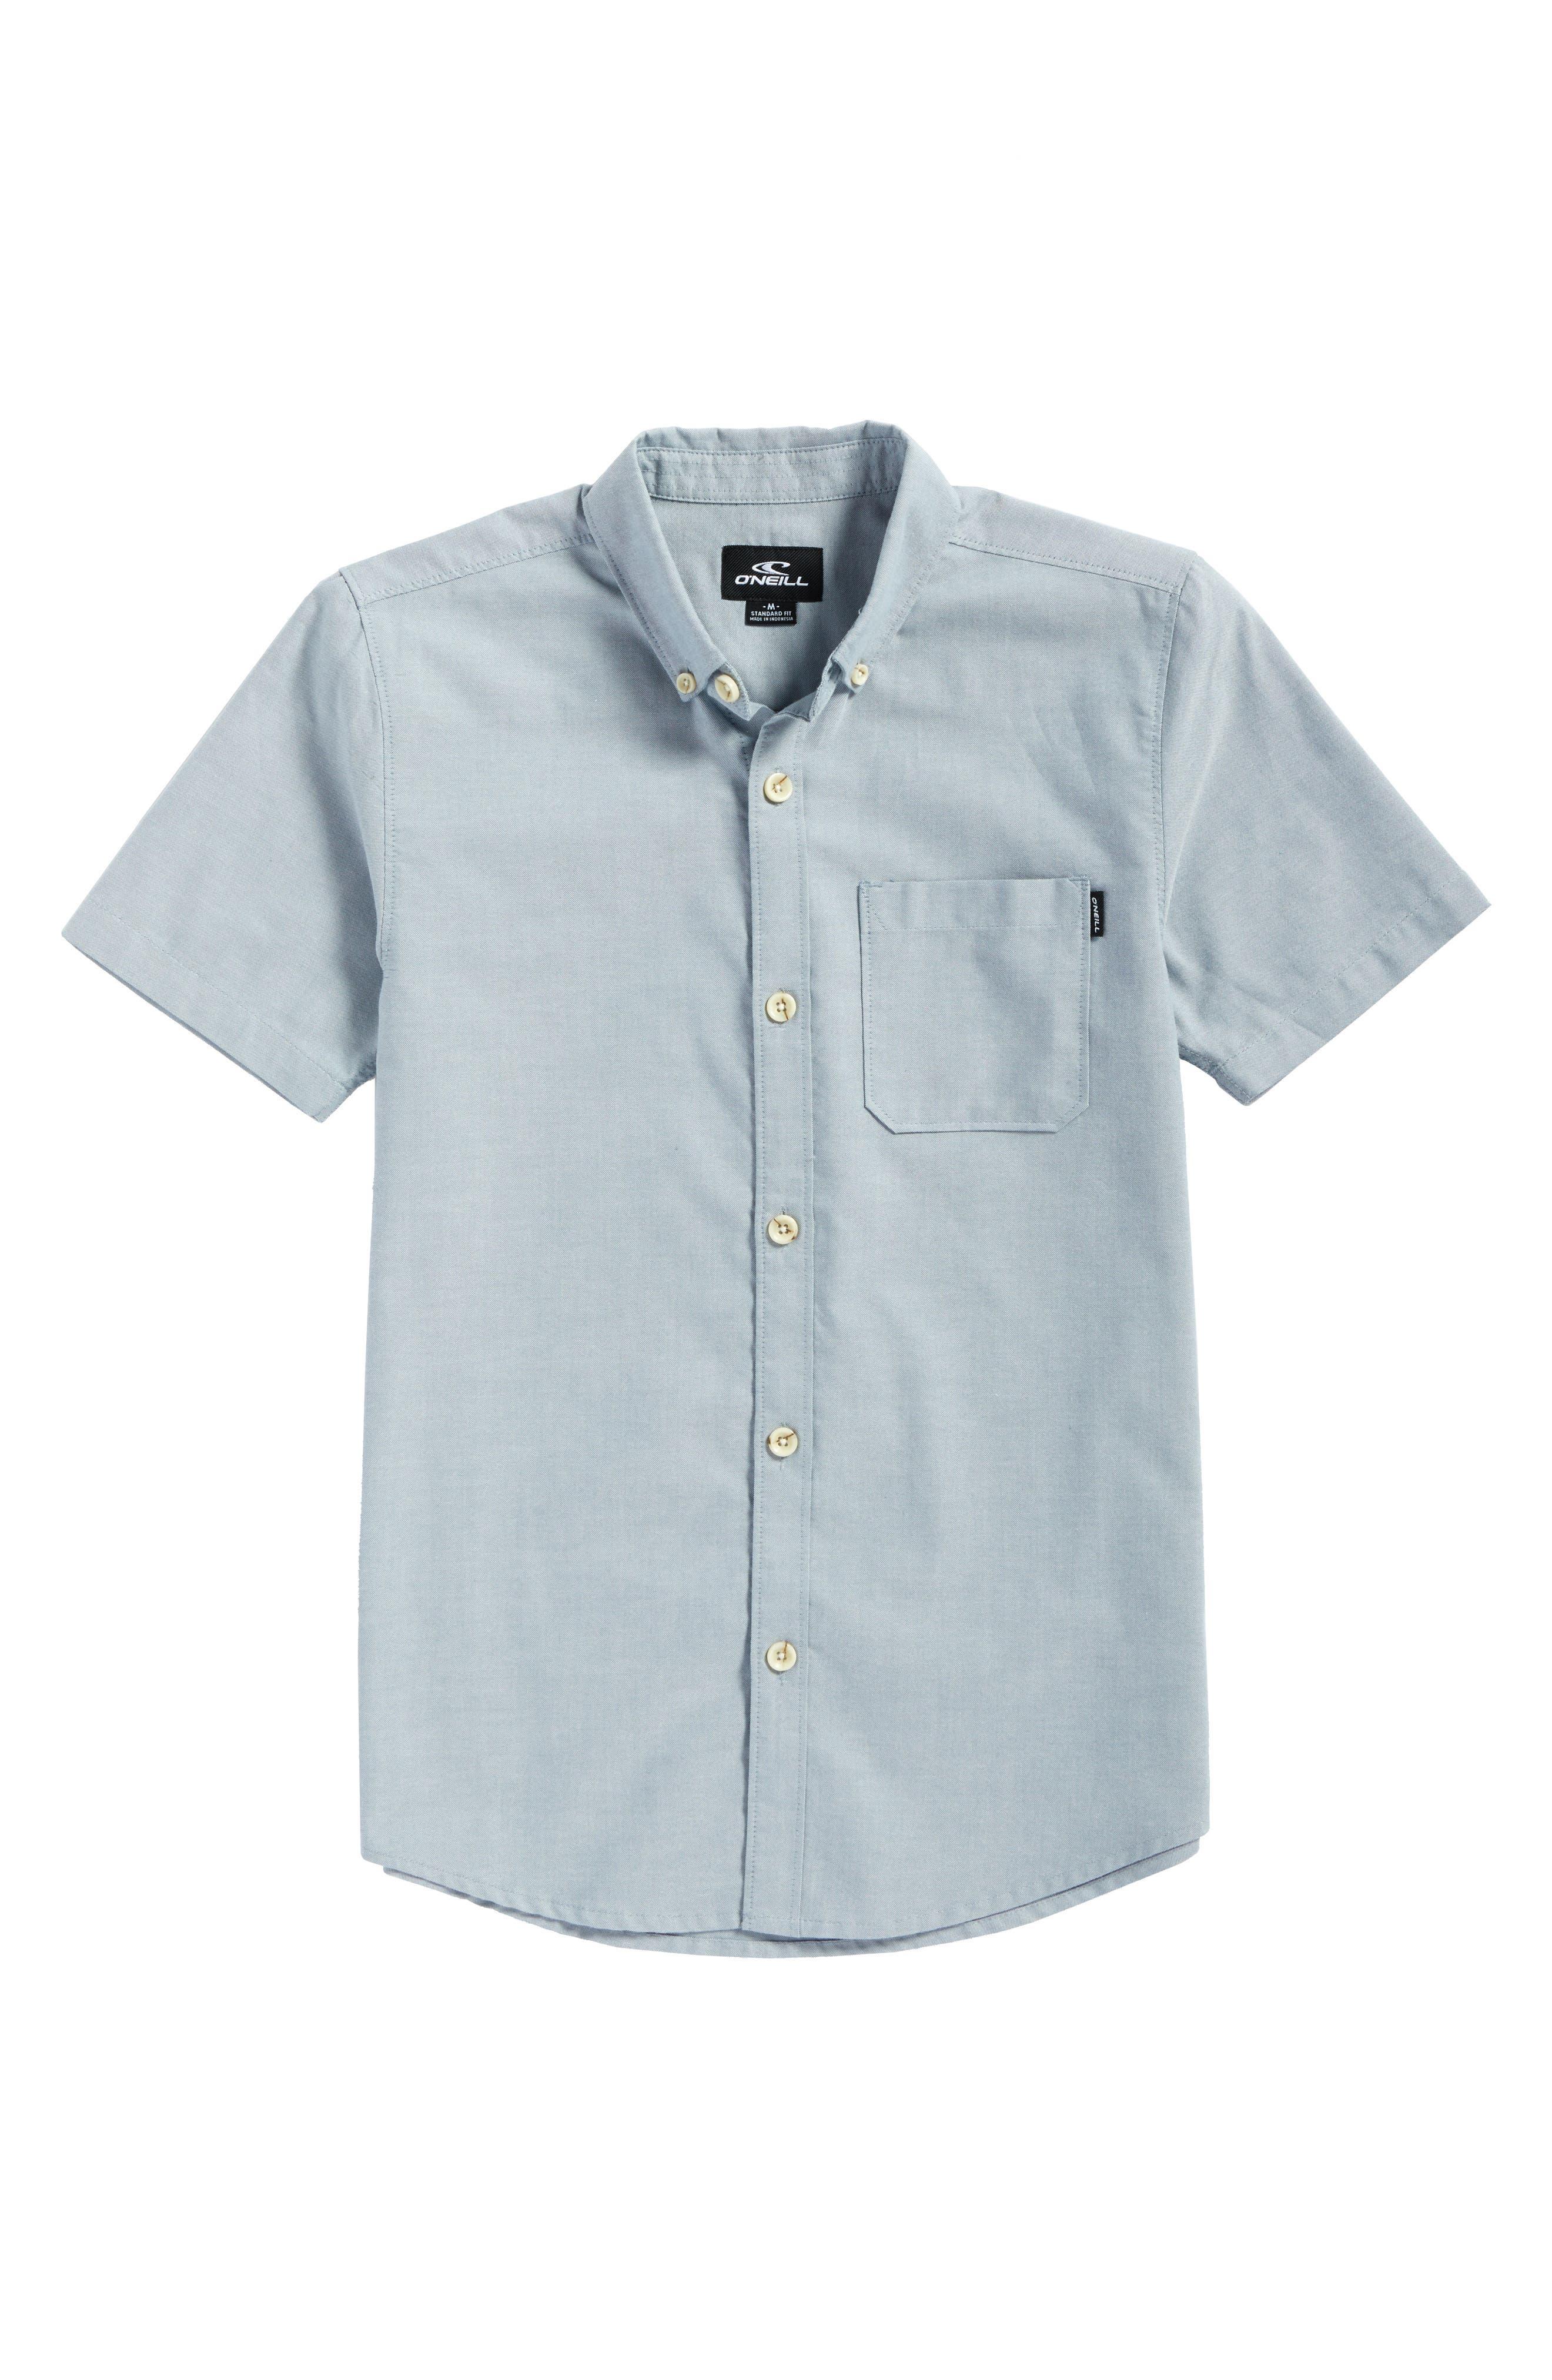 Main Image - O'Neill Bank Woven Shirt (Big Boys)